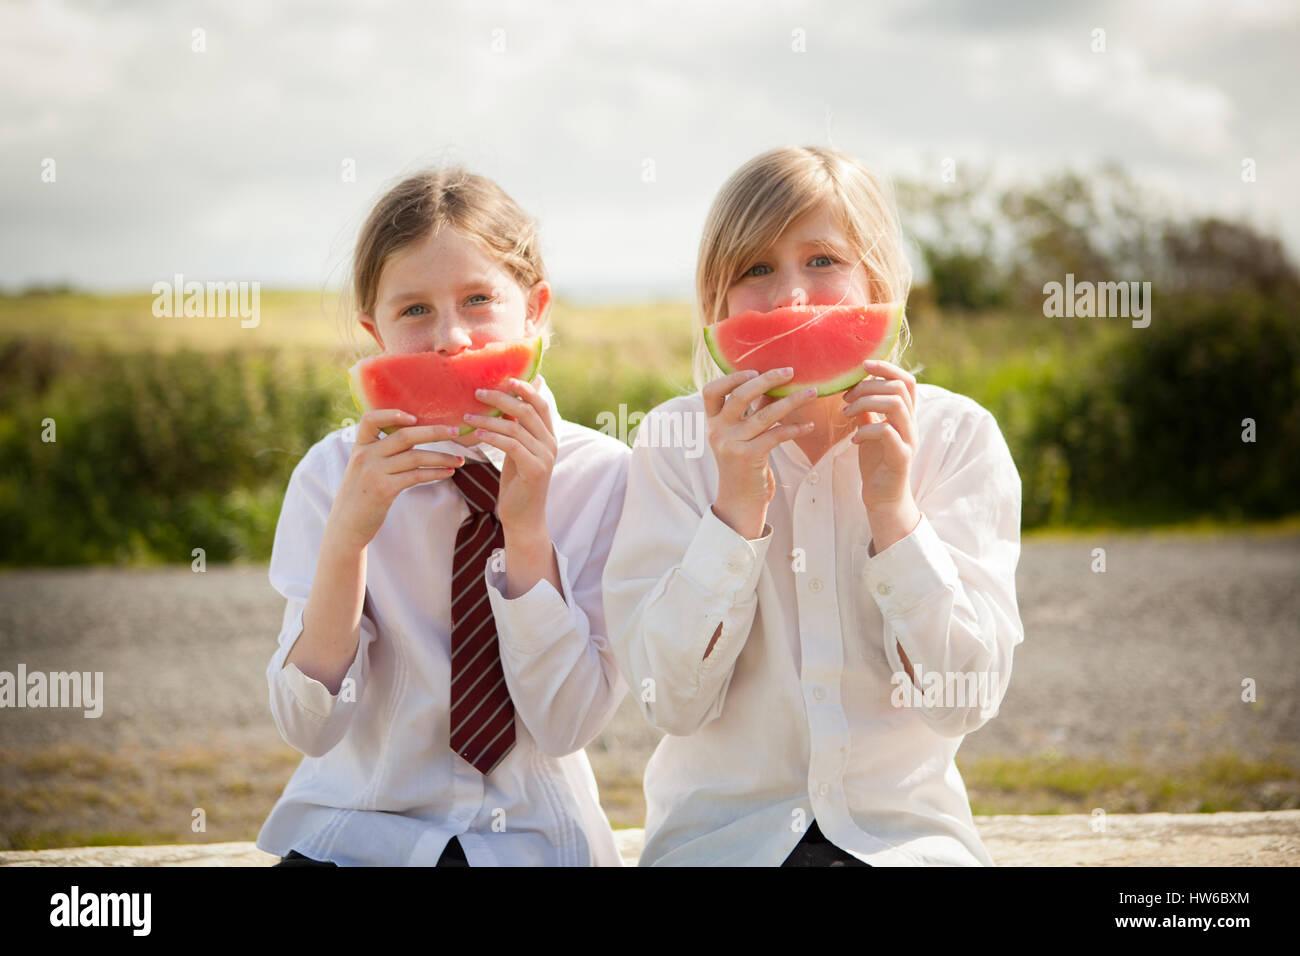 Girls eating watermelon Photo Stock